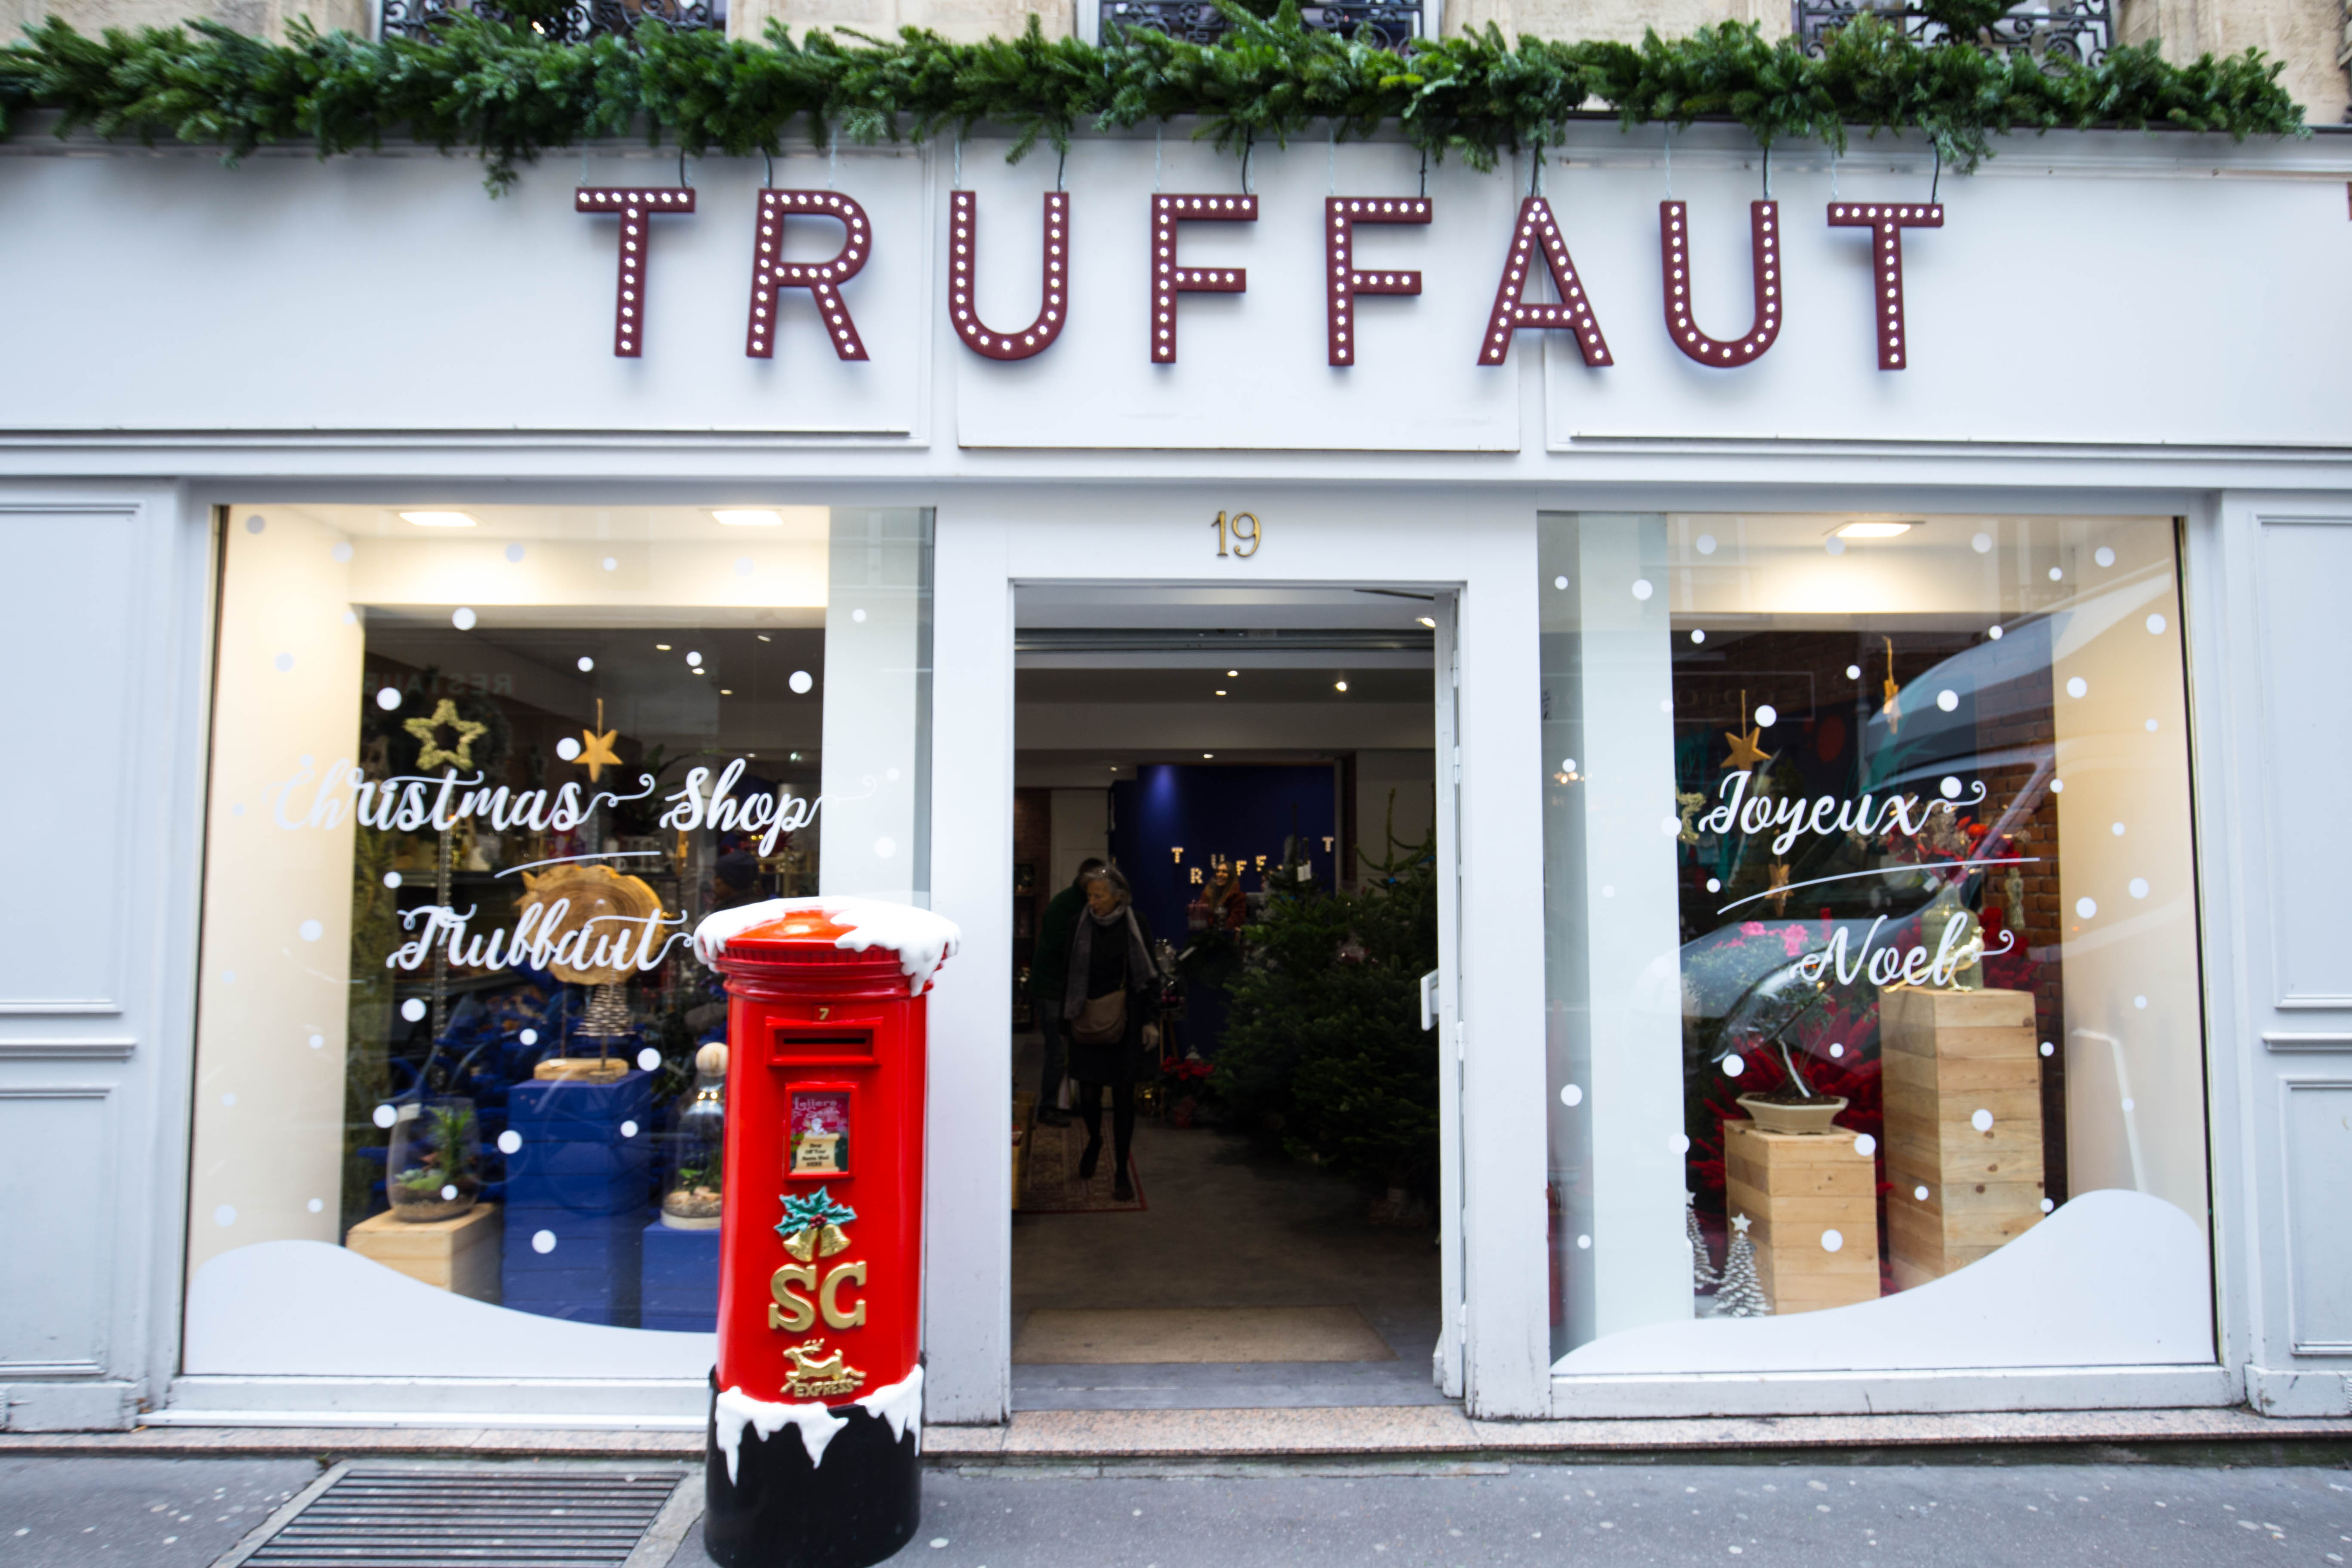 decoration noel 2018 truffaut IMG_0232   Storefront Blog decoration noel 2018 truffaut